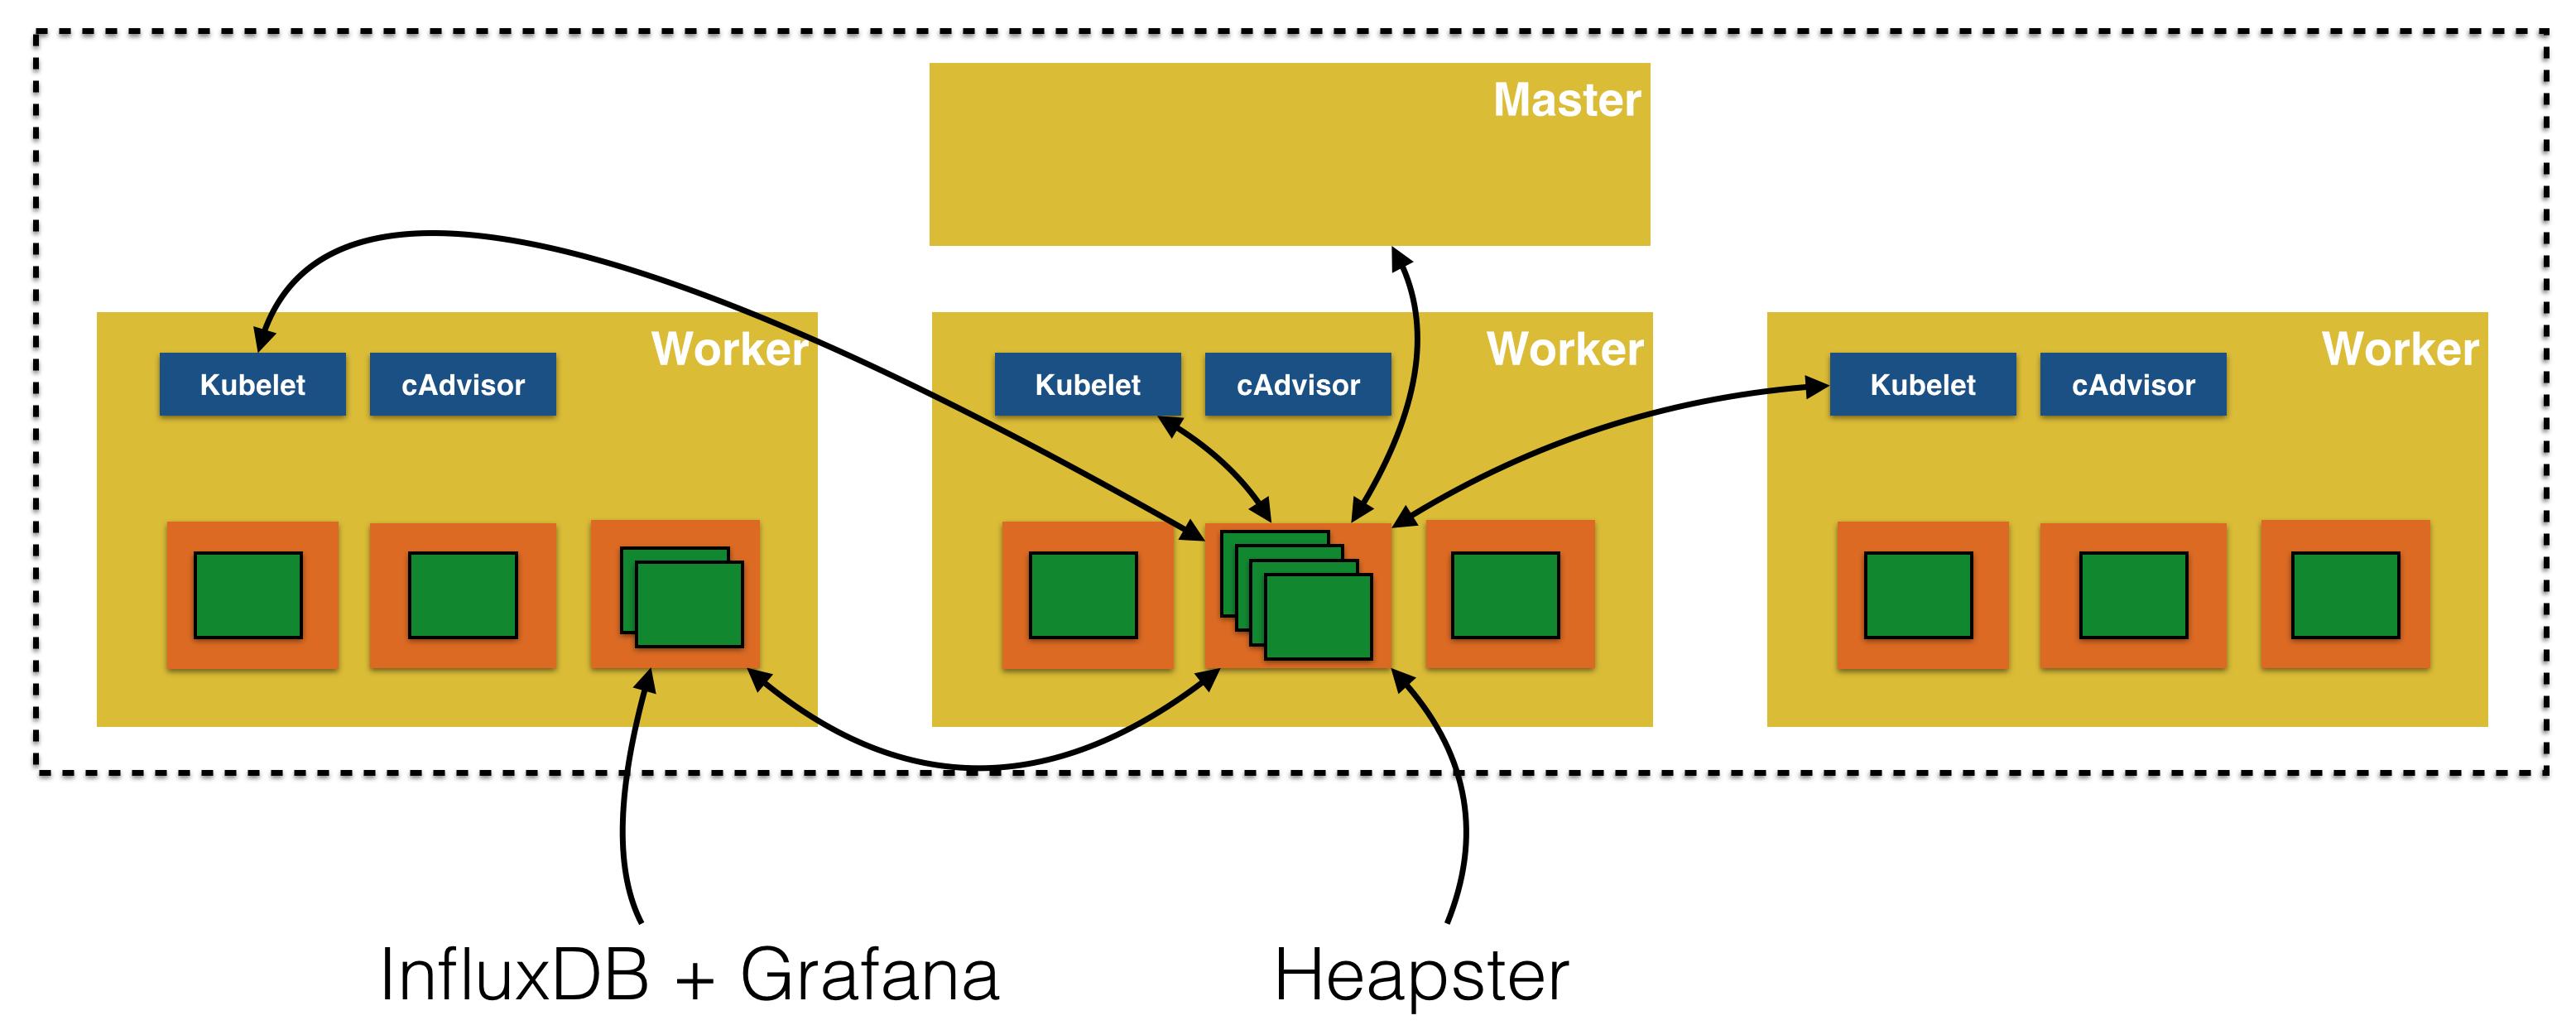 Kubernetes Monitoring with Heapster, InfluxDB and Grafana